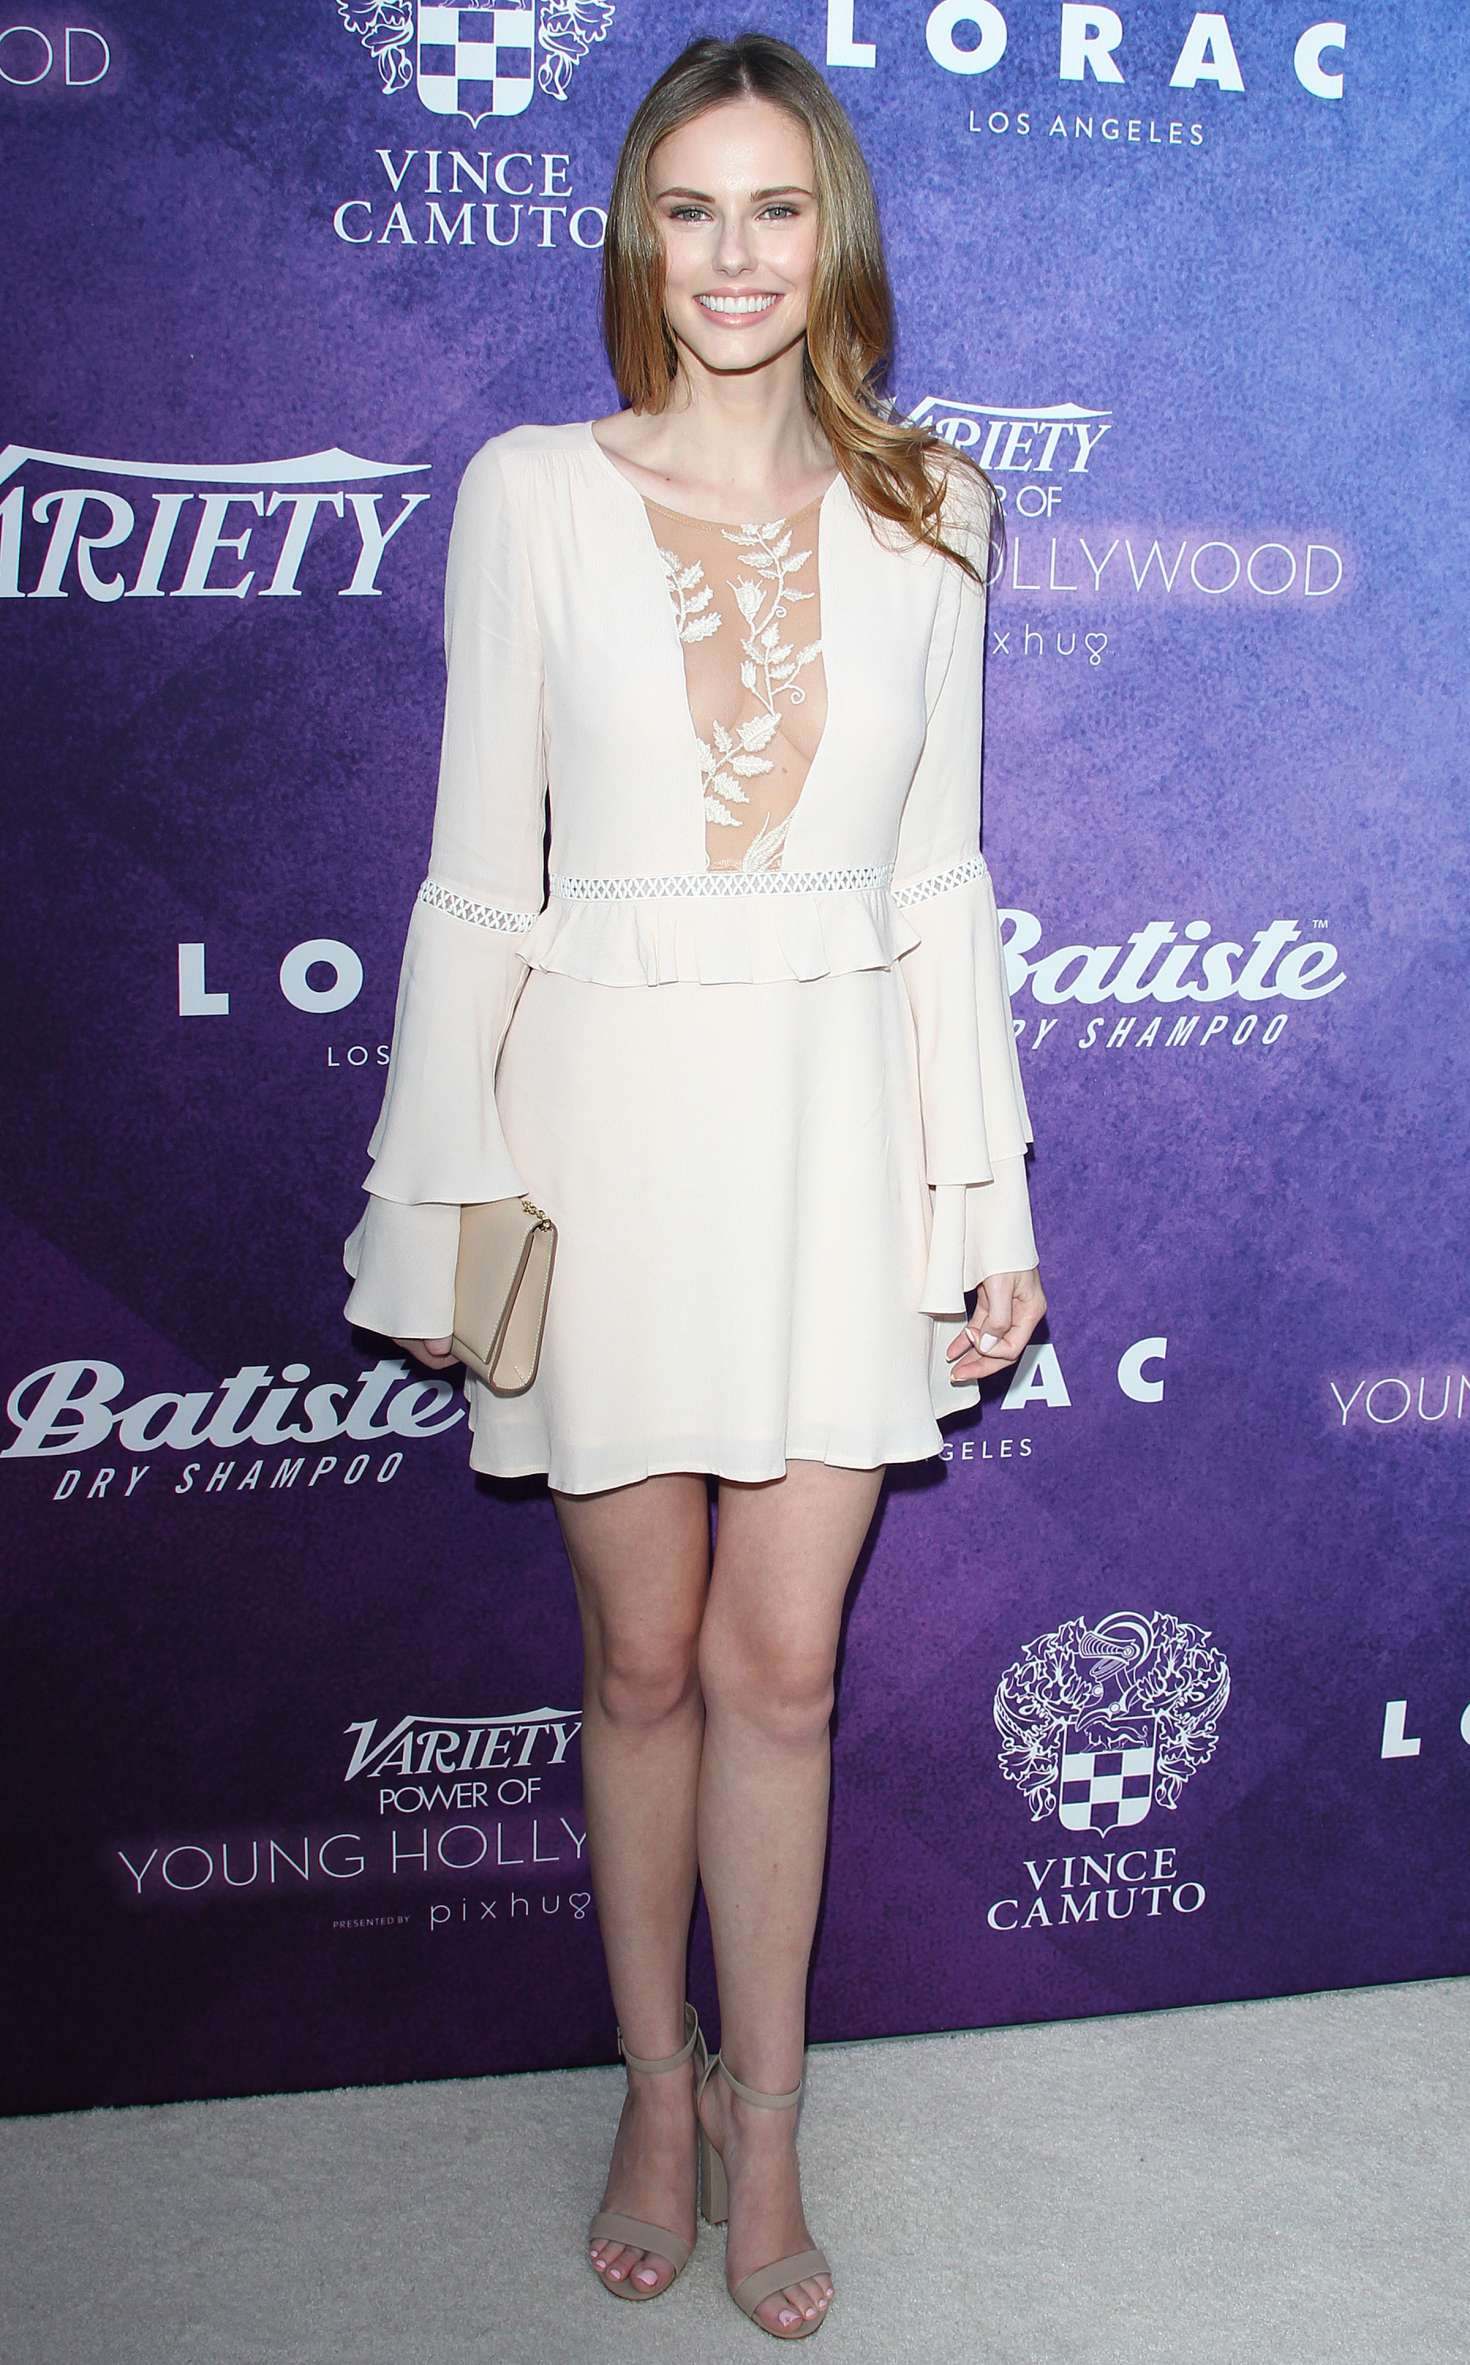 Alyssa Campanella - 2016 Variety - Power of Young Hollywood in Los Angeles